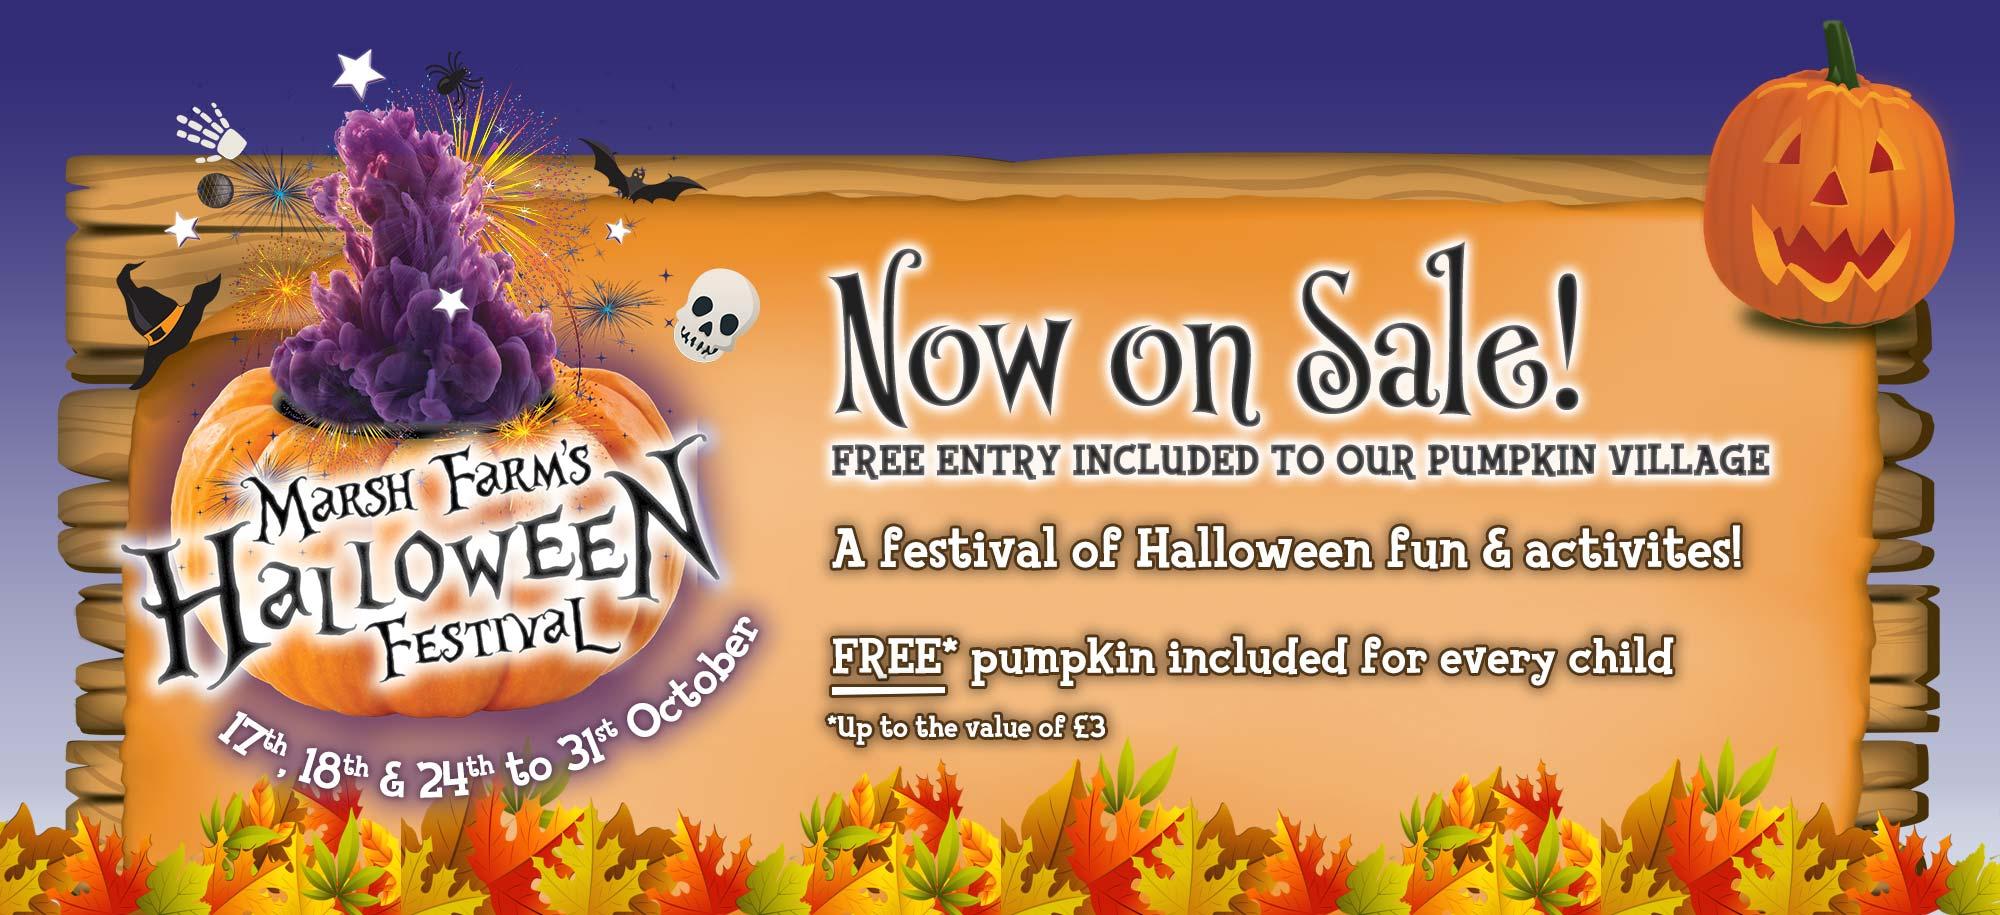 Halloween Festival now on SALE!